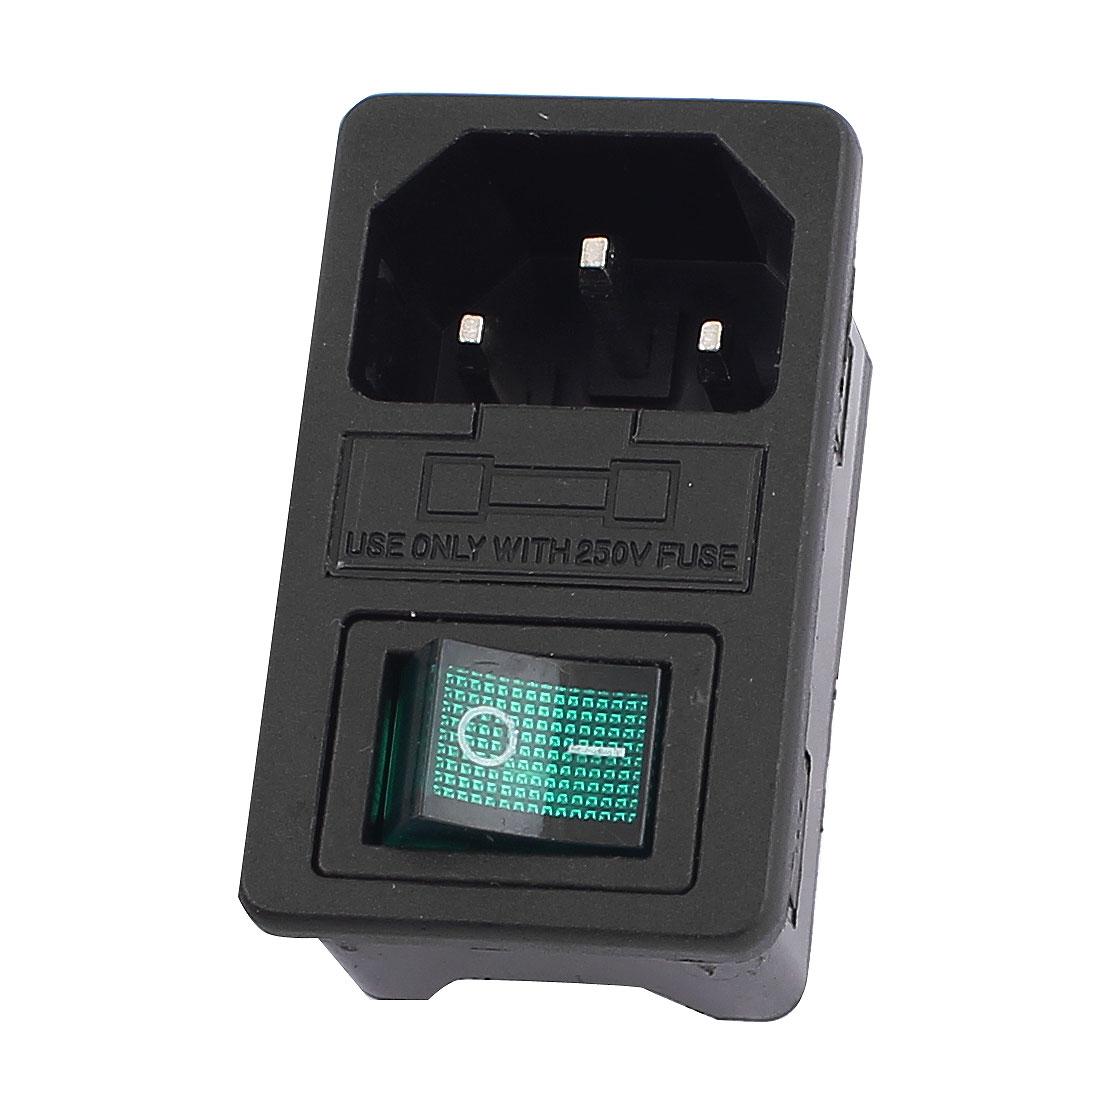 AC 250V 10A Green Lamp Rocker Switch Fuse Holder IEC320 C14 Inlet Power Socket